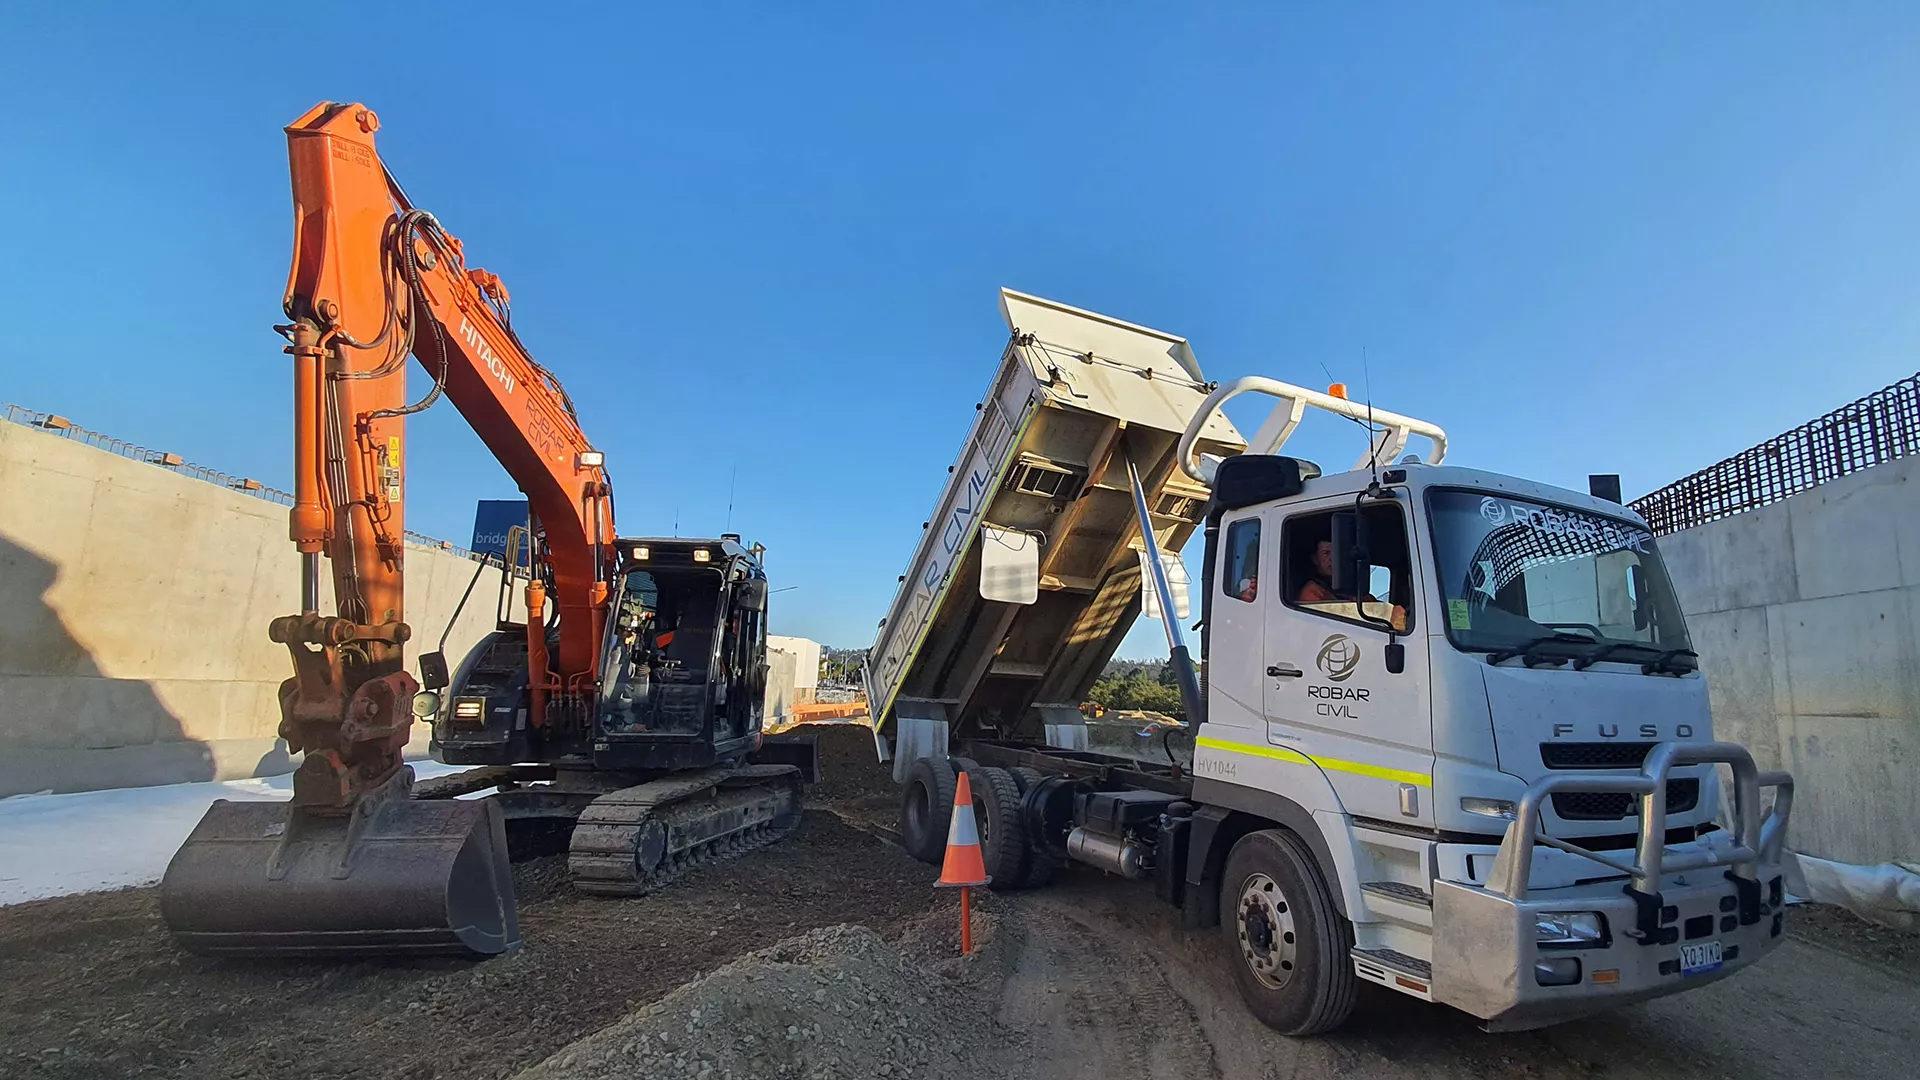 truck and excavator.jpg